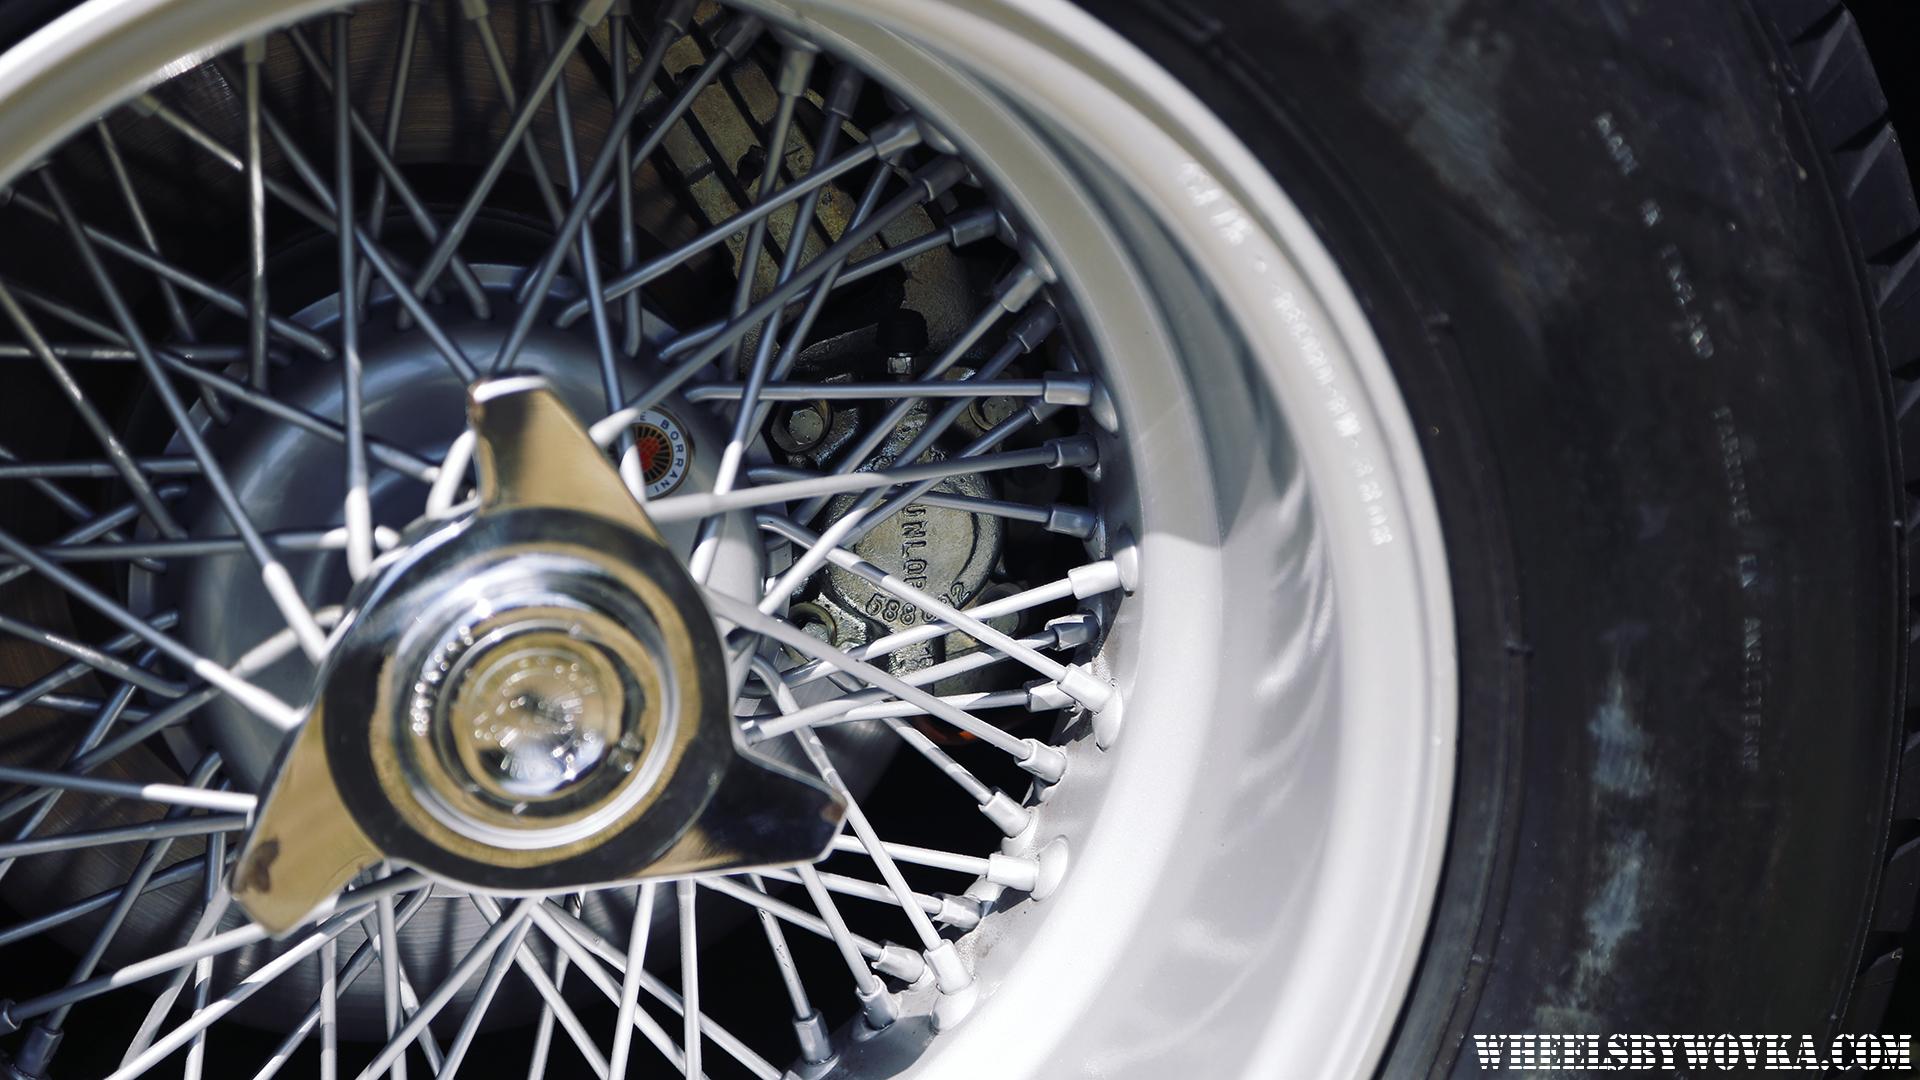 1964-ferrari-250-gto-sold-for-72m-dollars-by-wheelsbywovka-10